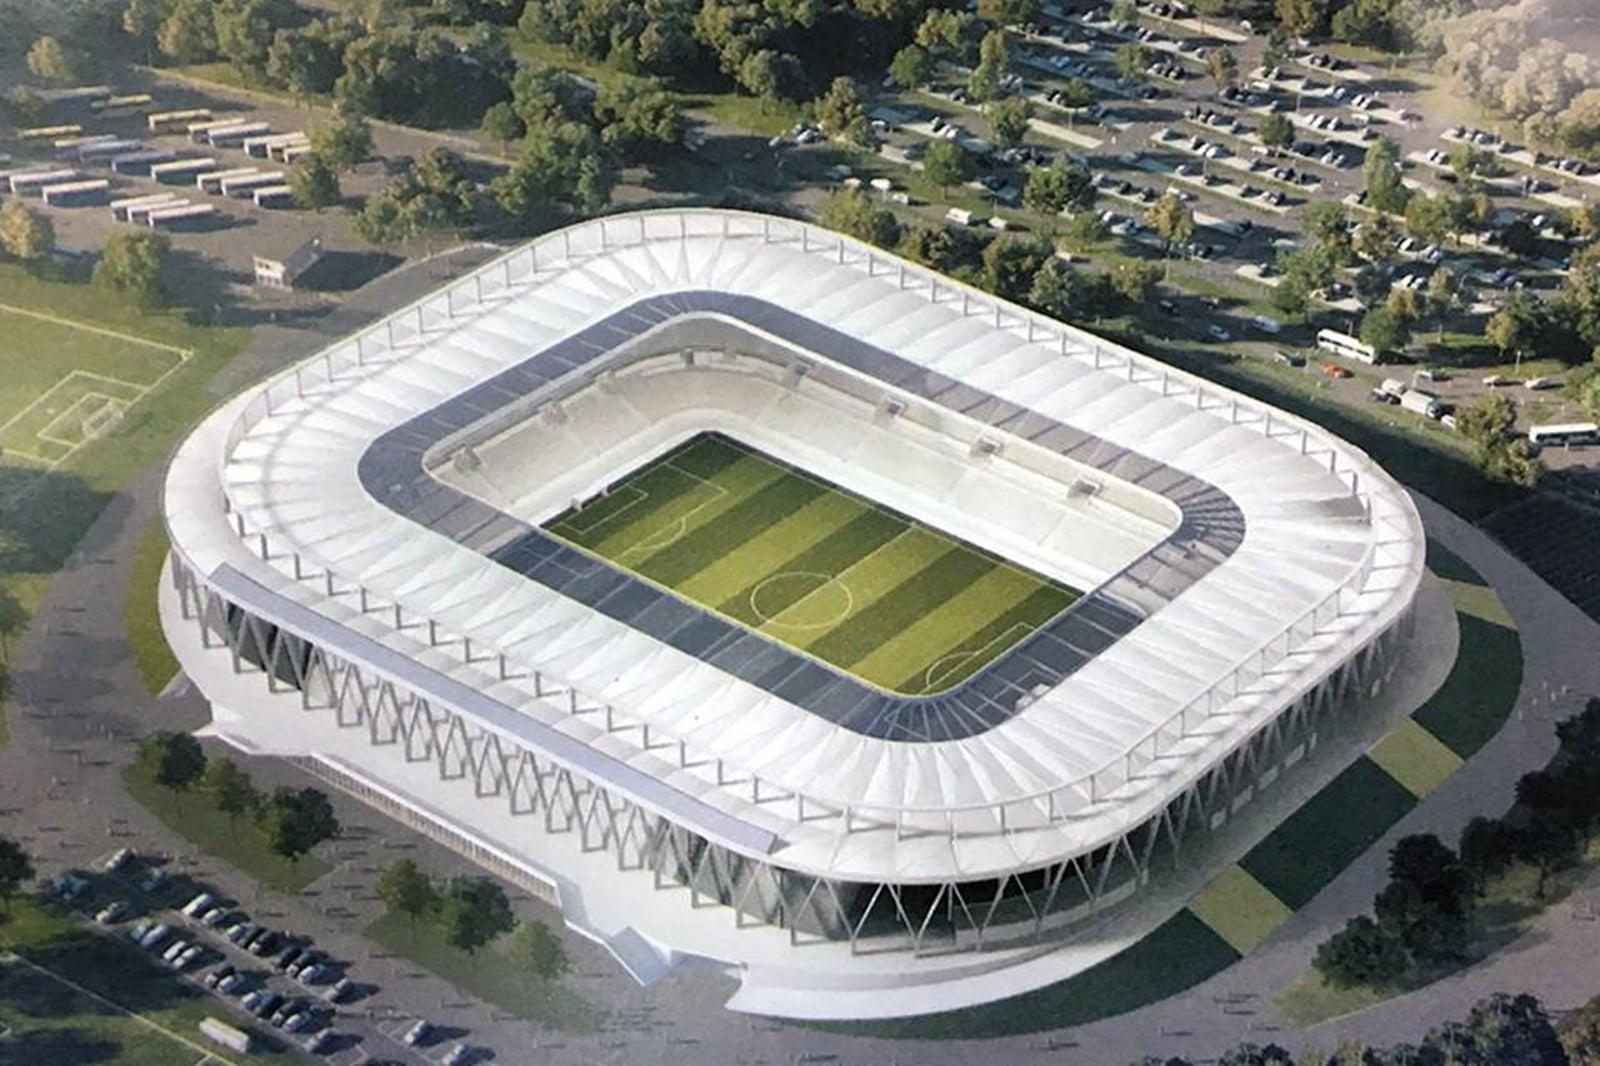 Neues Ksc Stadion